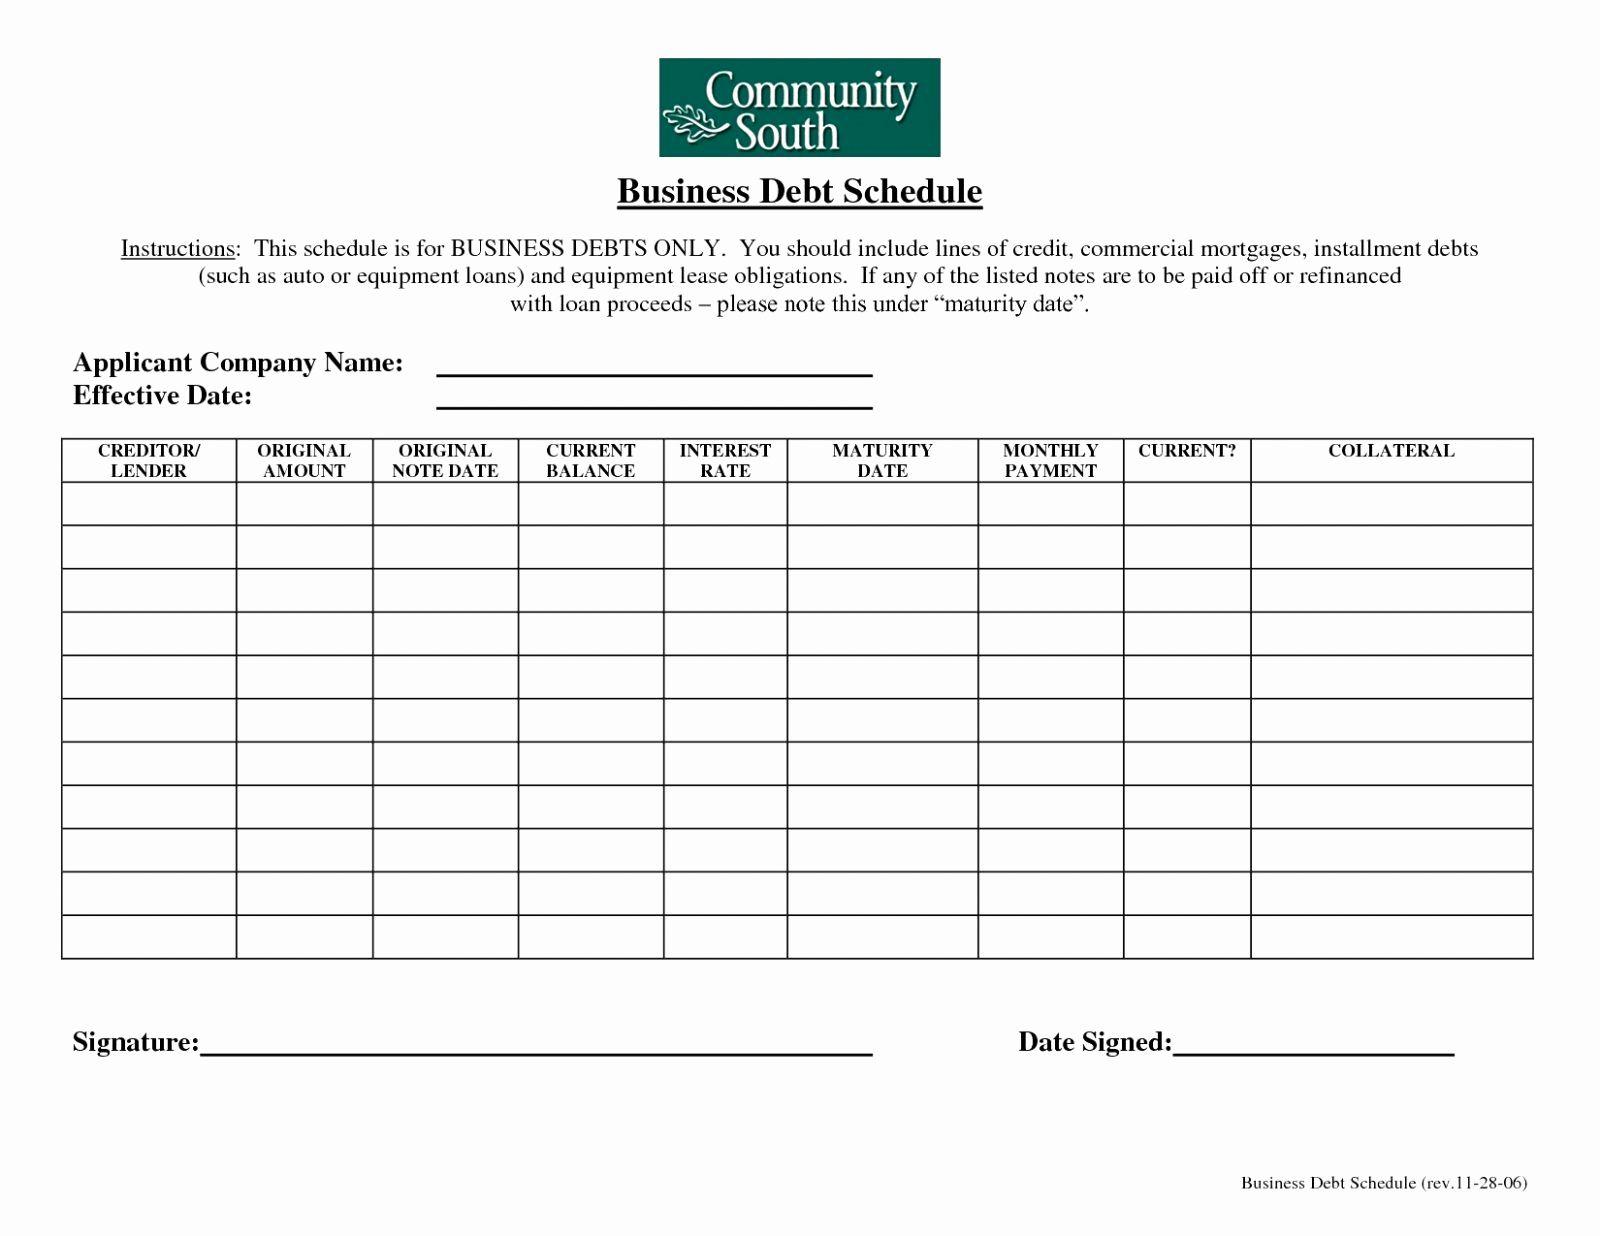 Equipment Lease Calculator Excel Spreadsheet Pertaining To Car Lease Calculator Excel Template  Glendale Community Document